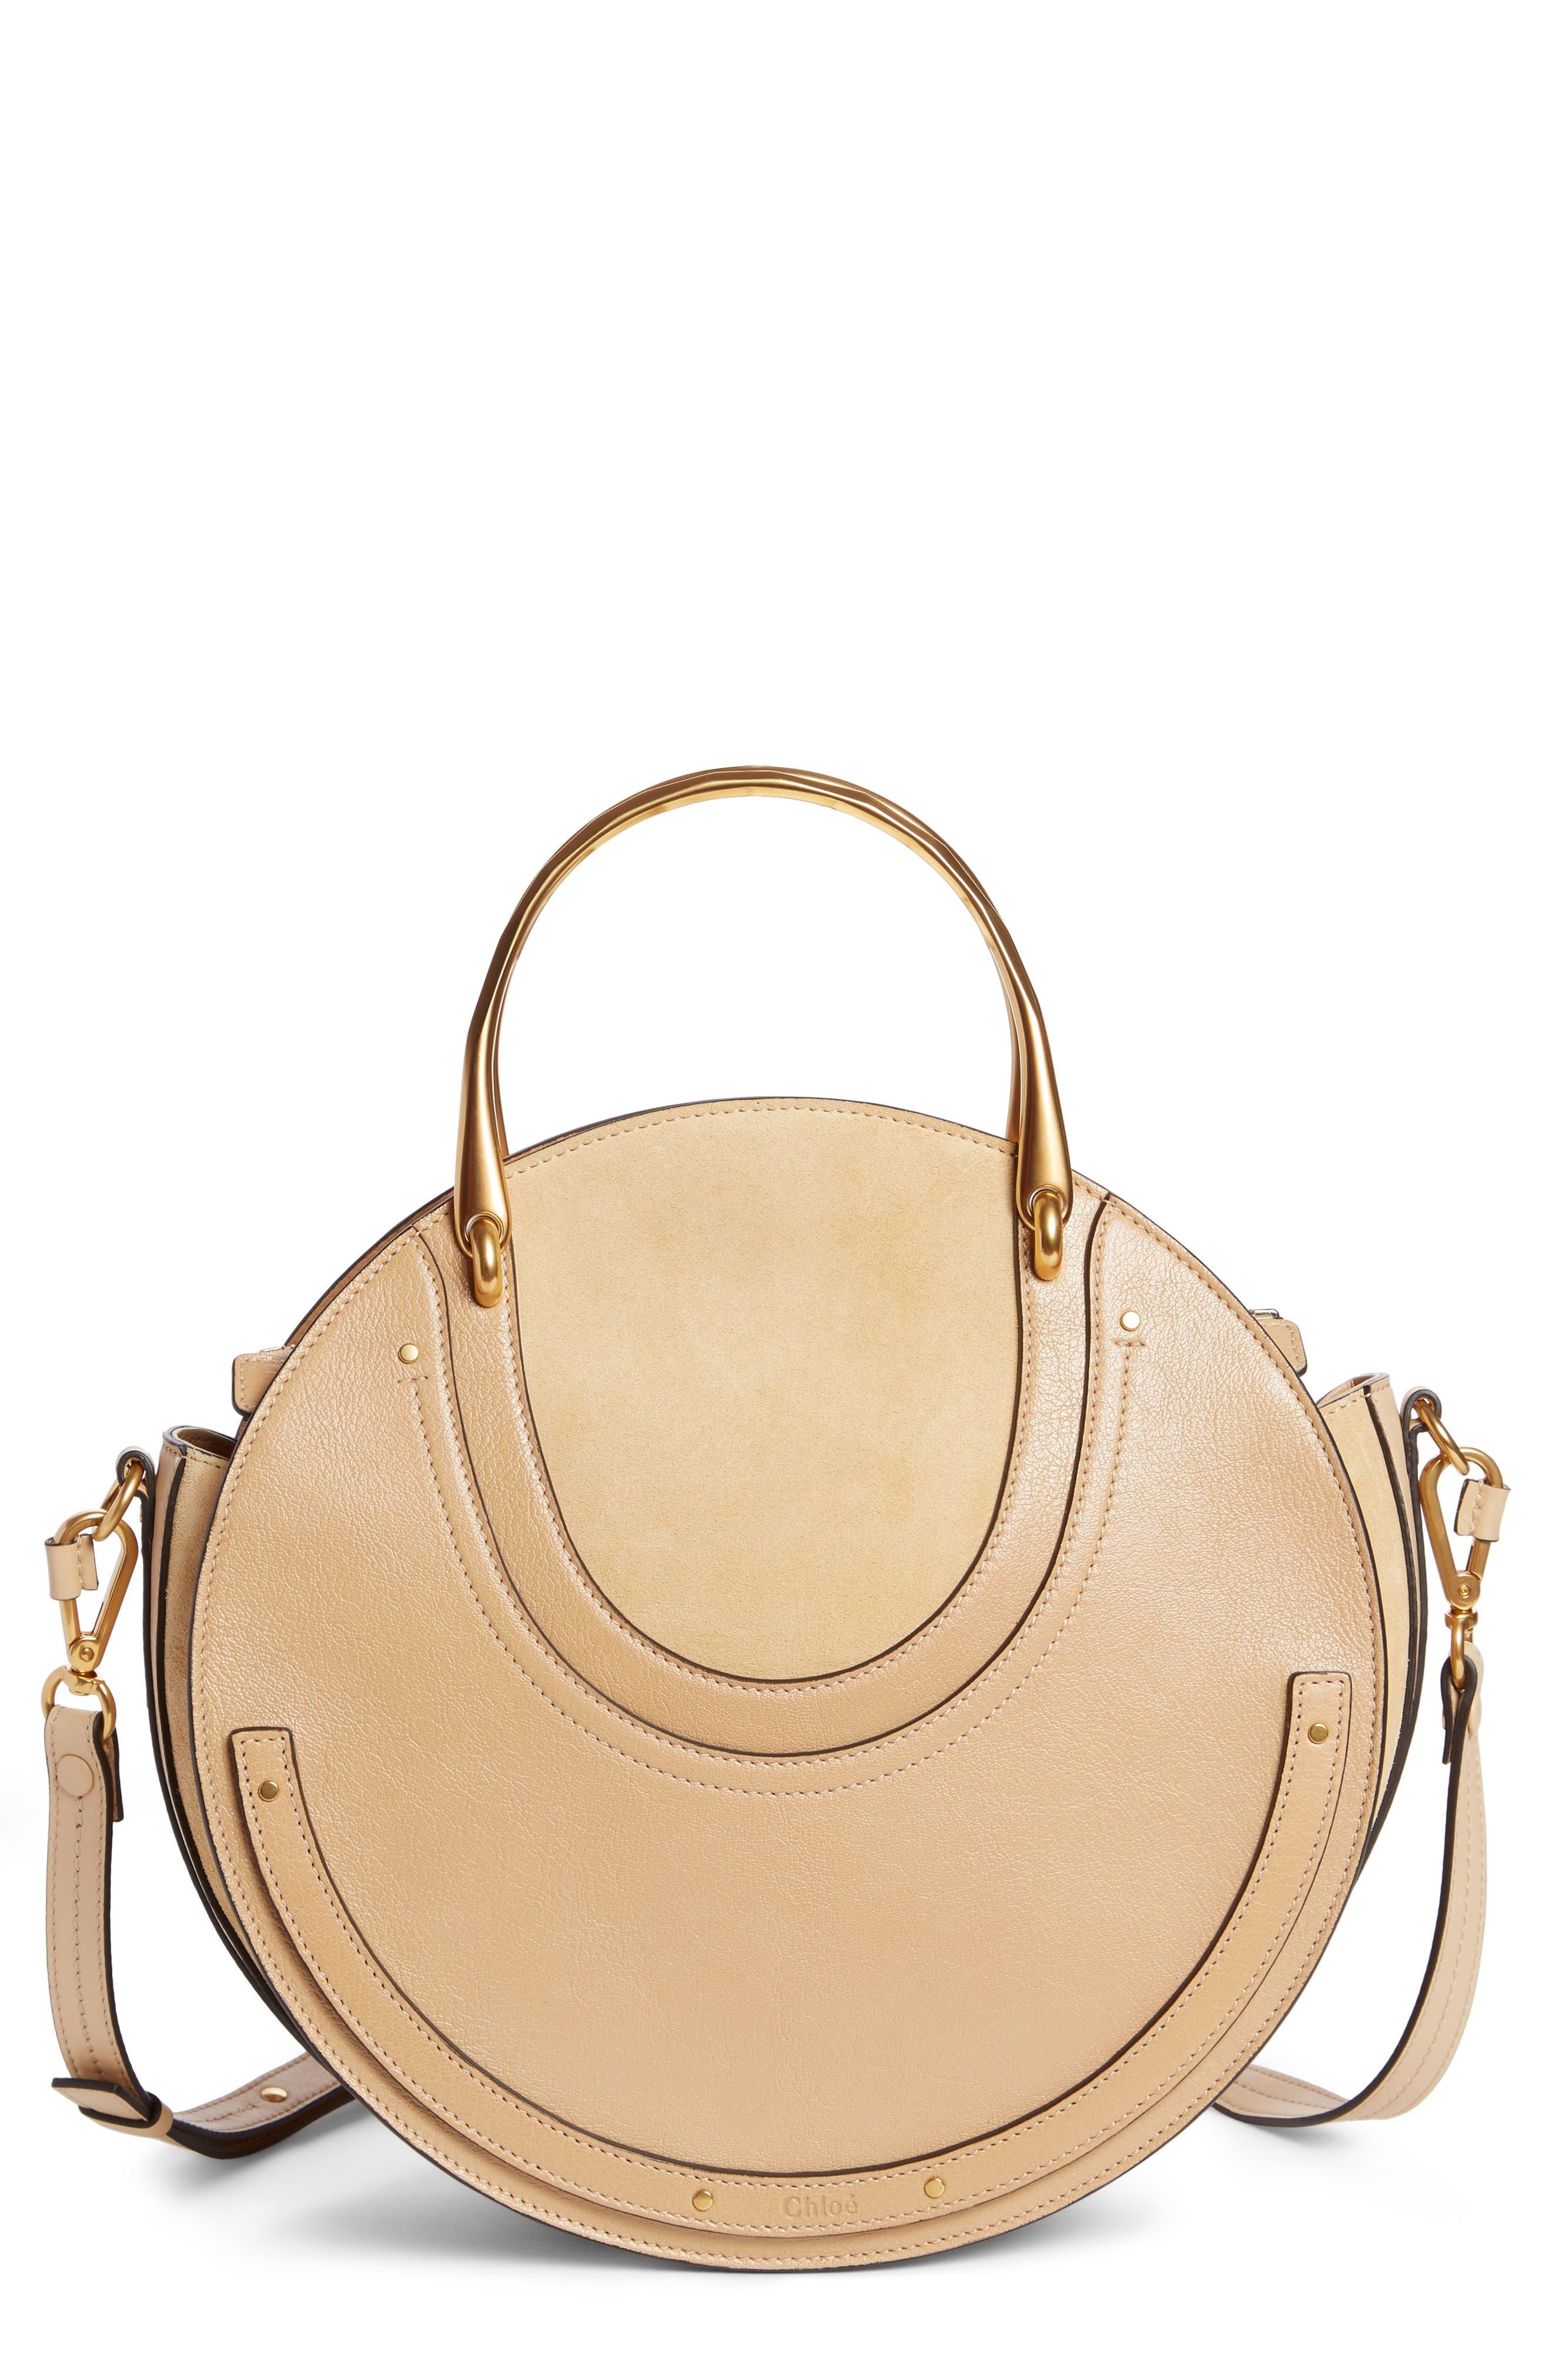 Chloé Small Pixie Maxi Leather Satchel